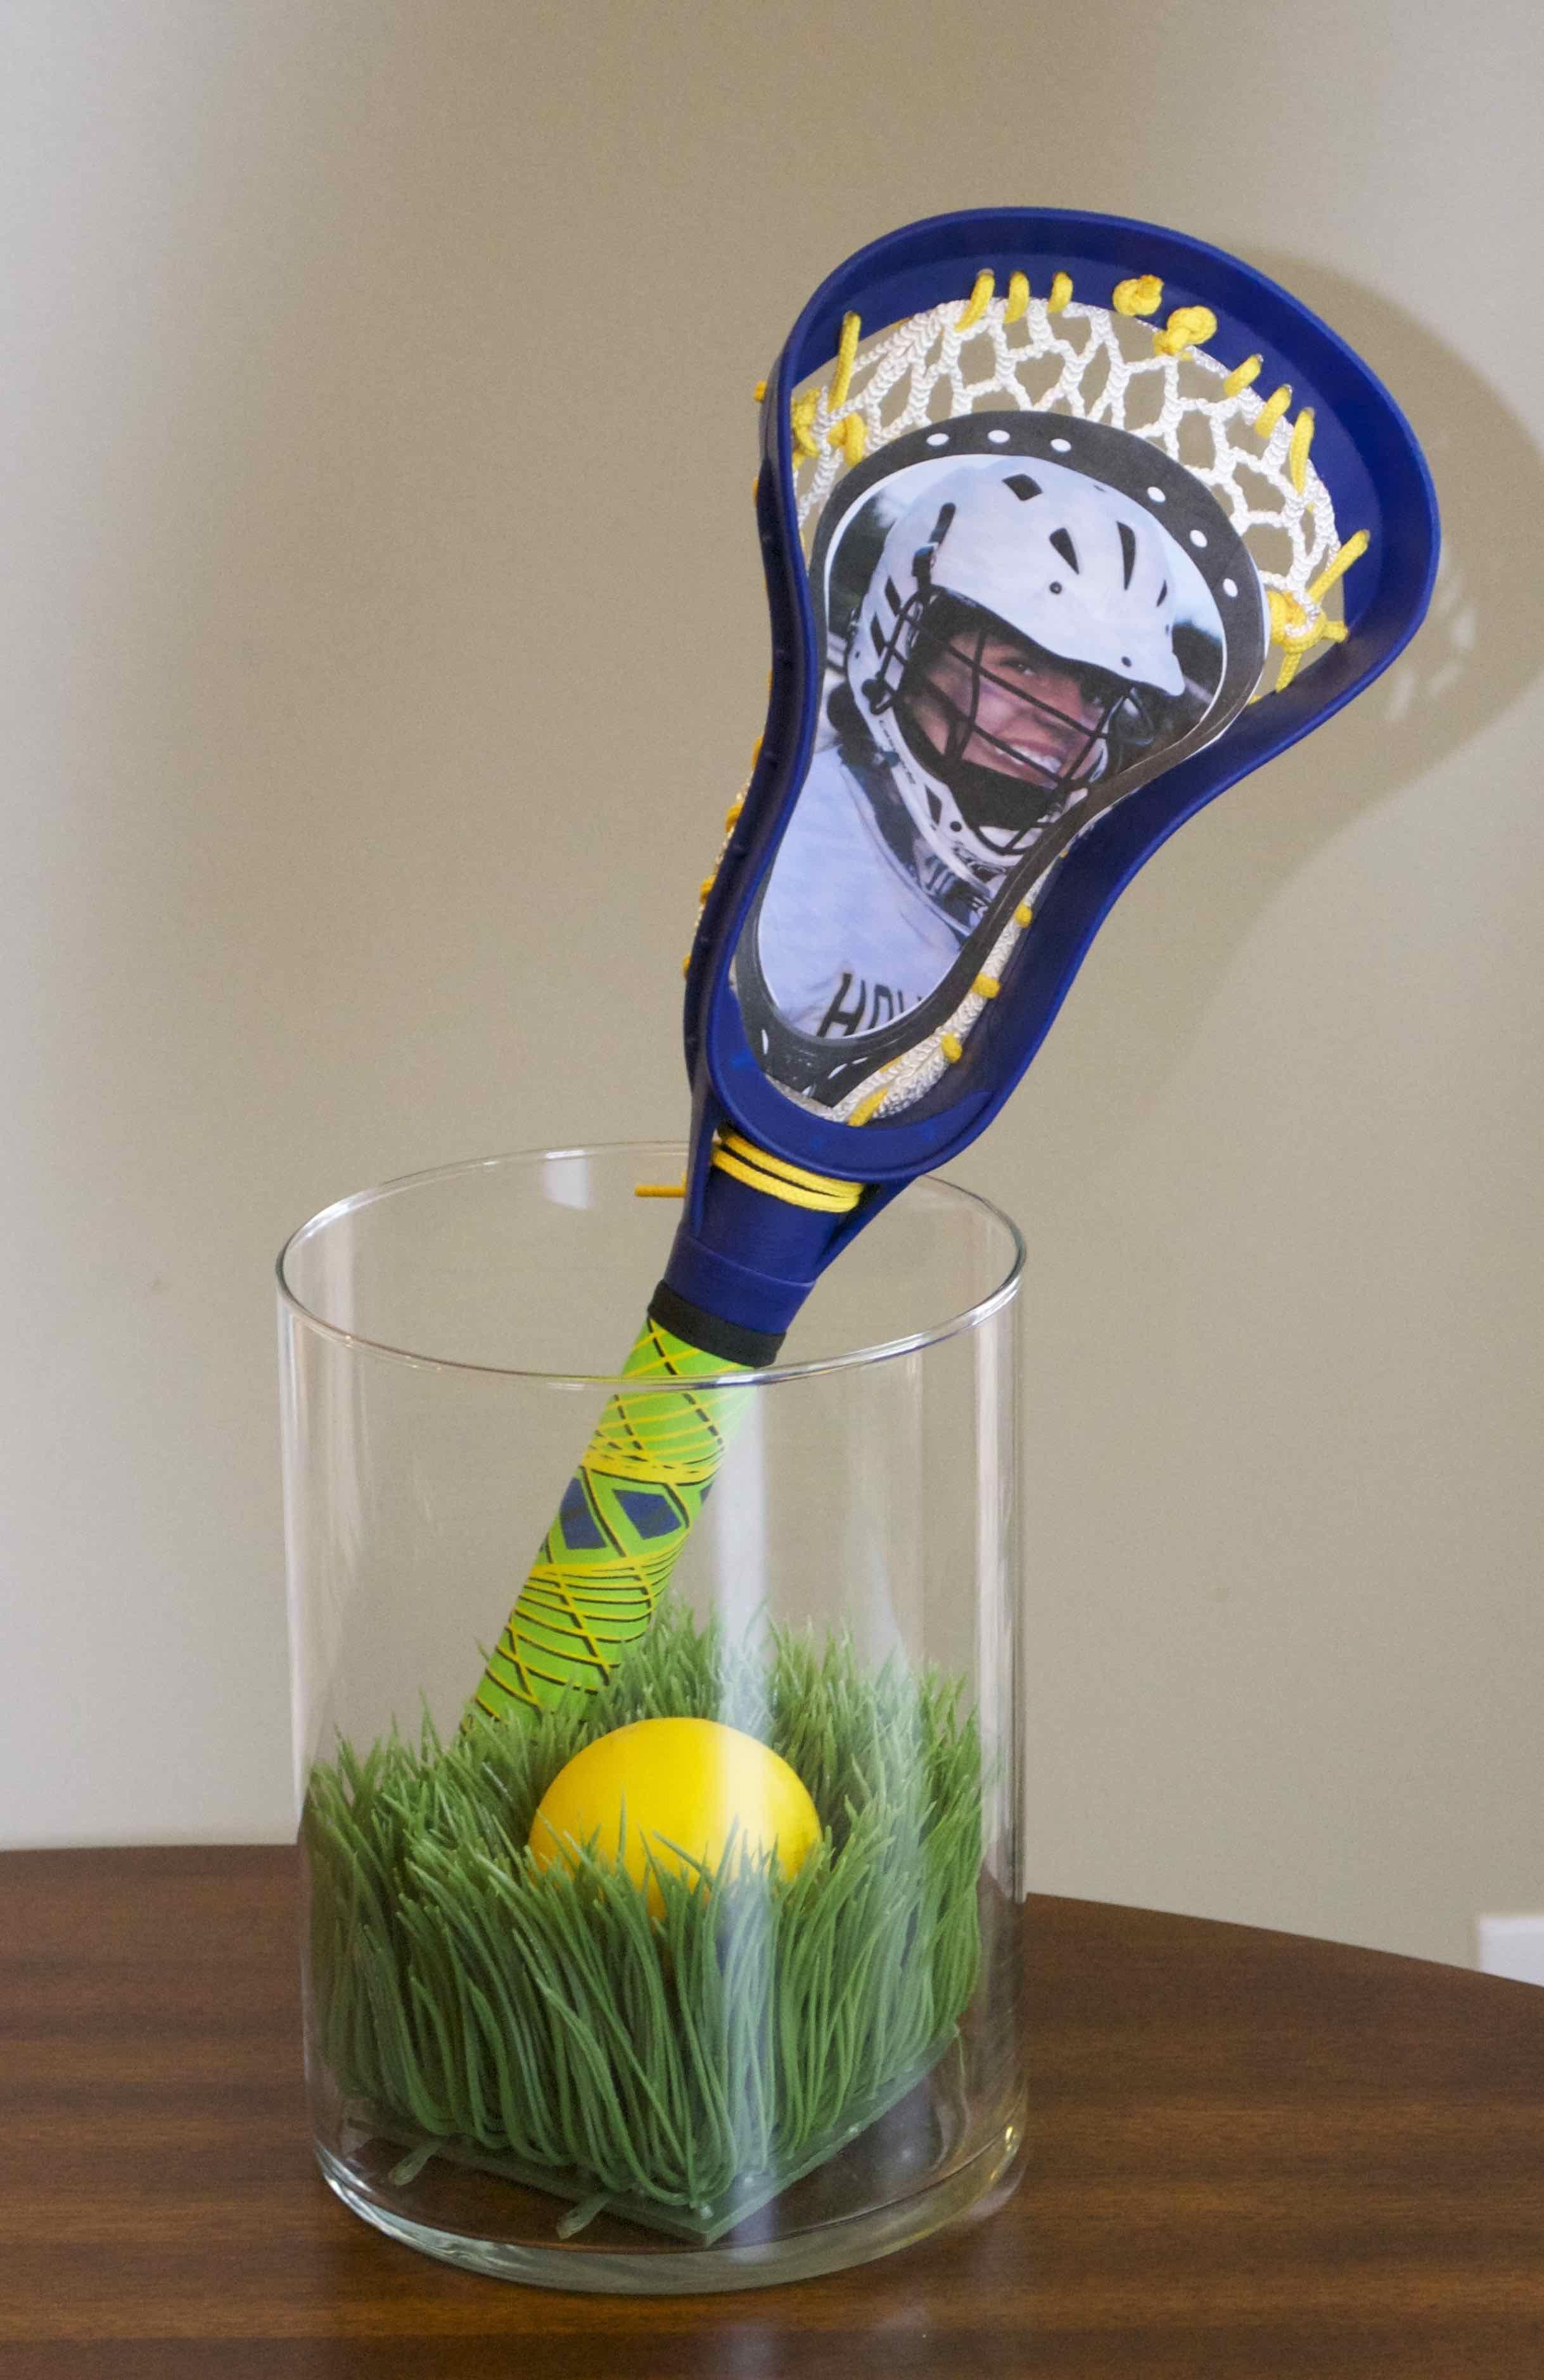 Lax Banquet Centerpiece, Artifical Grass, Lacrosse Ball, Pool Lacrosse Stick,